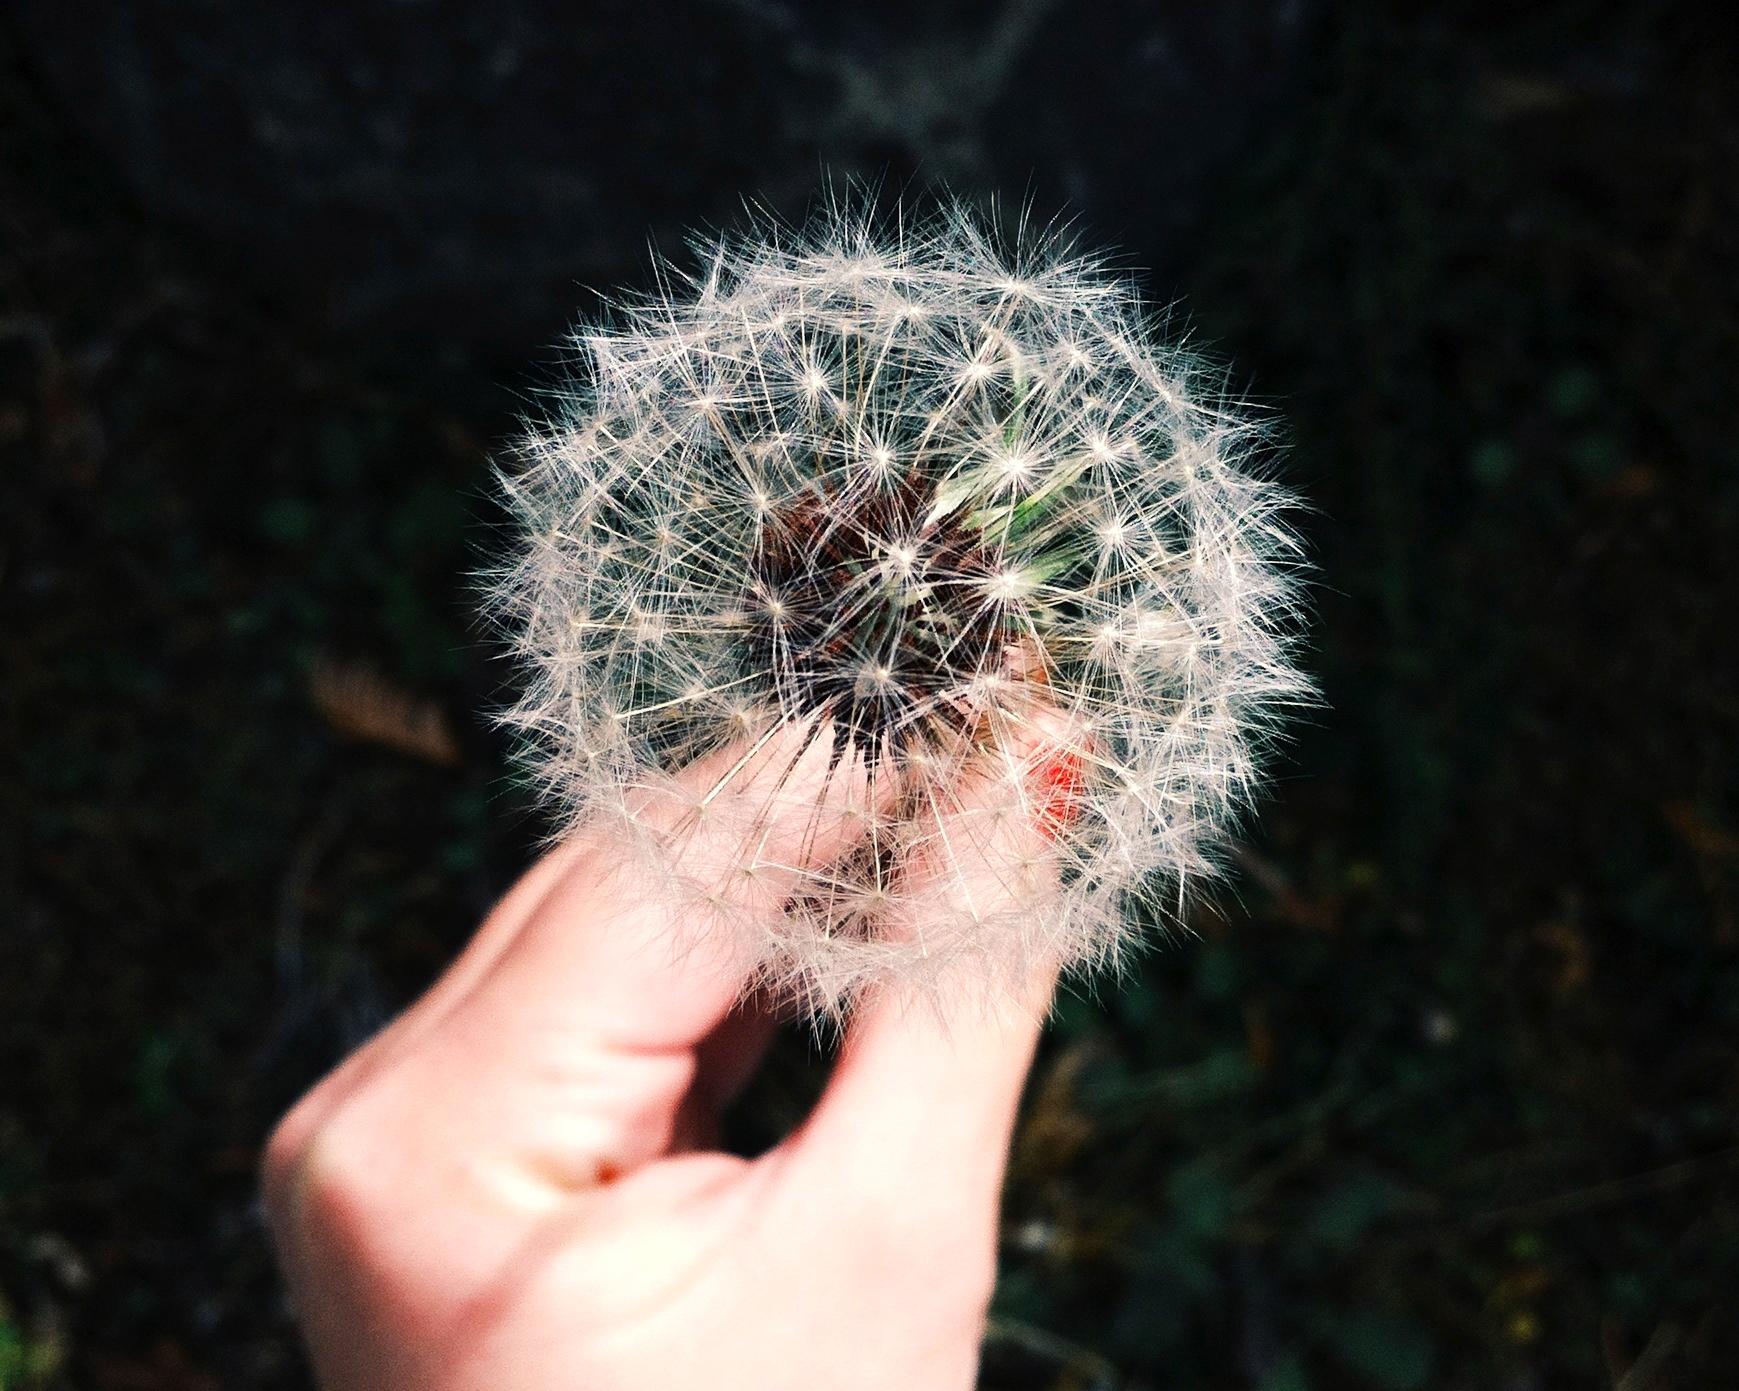 Holding a dandelion